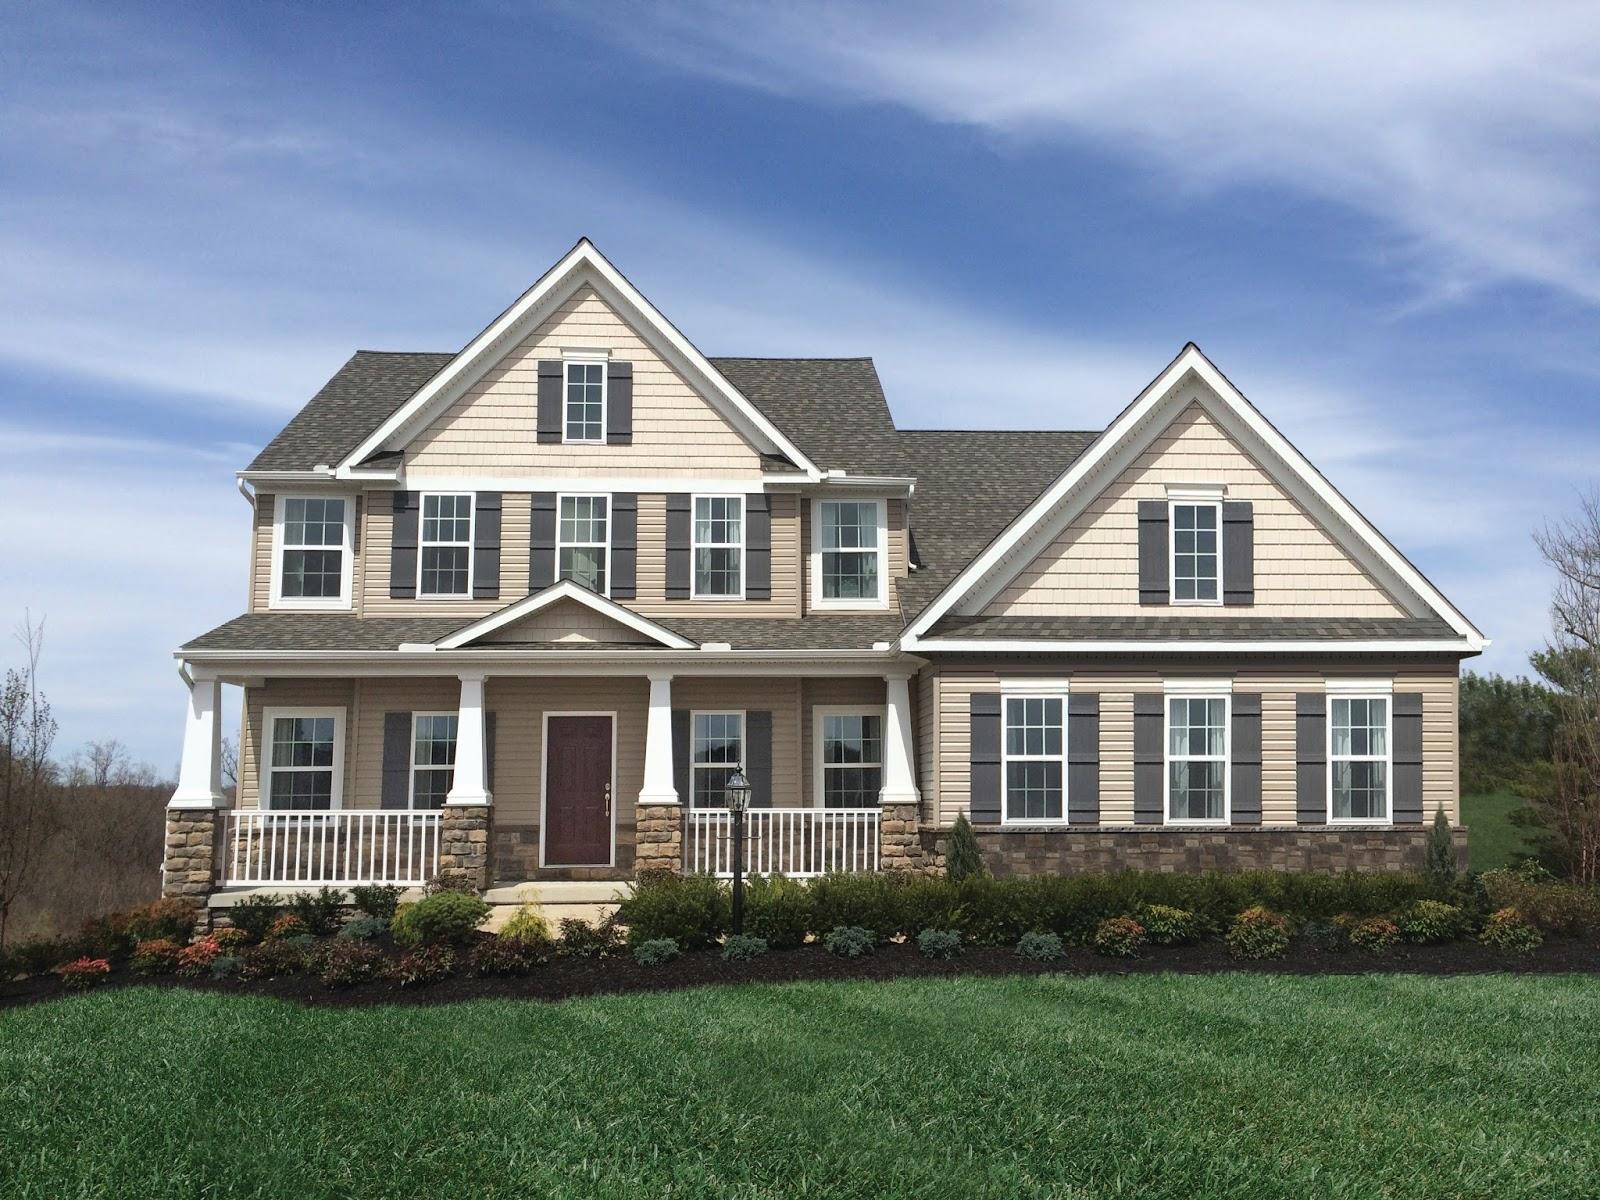 New Home Marketing Keystone Custom Homes Begins Building